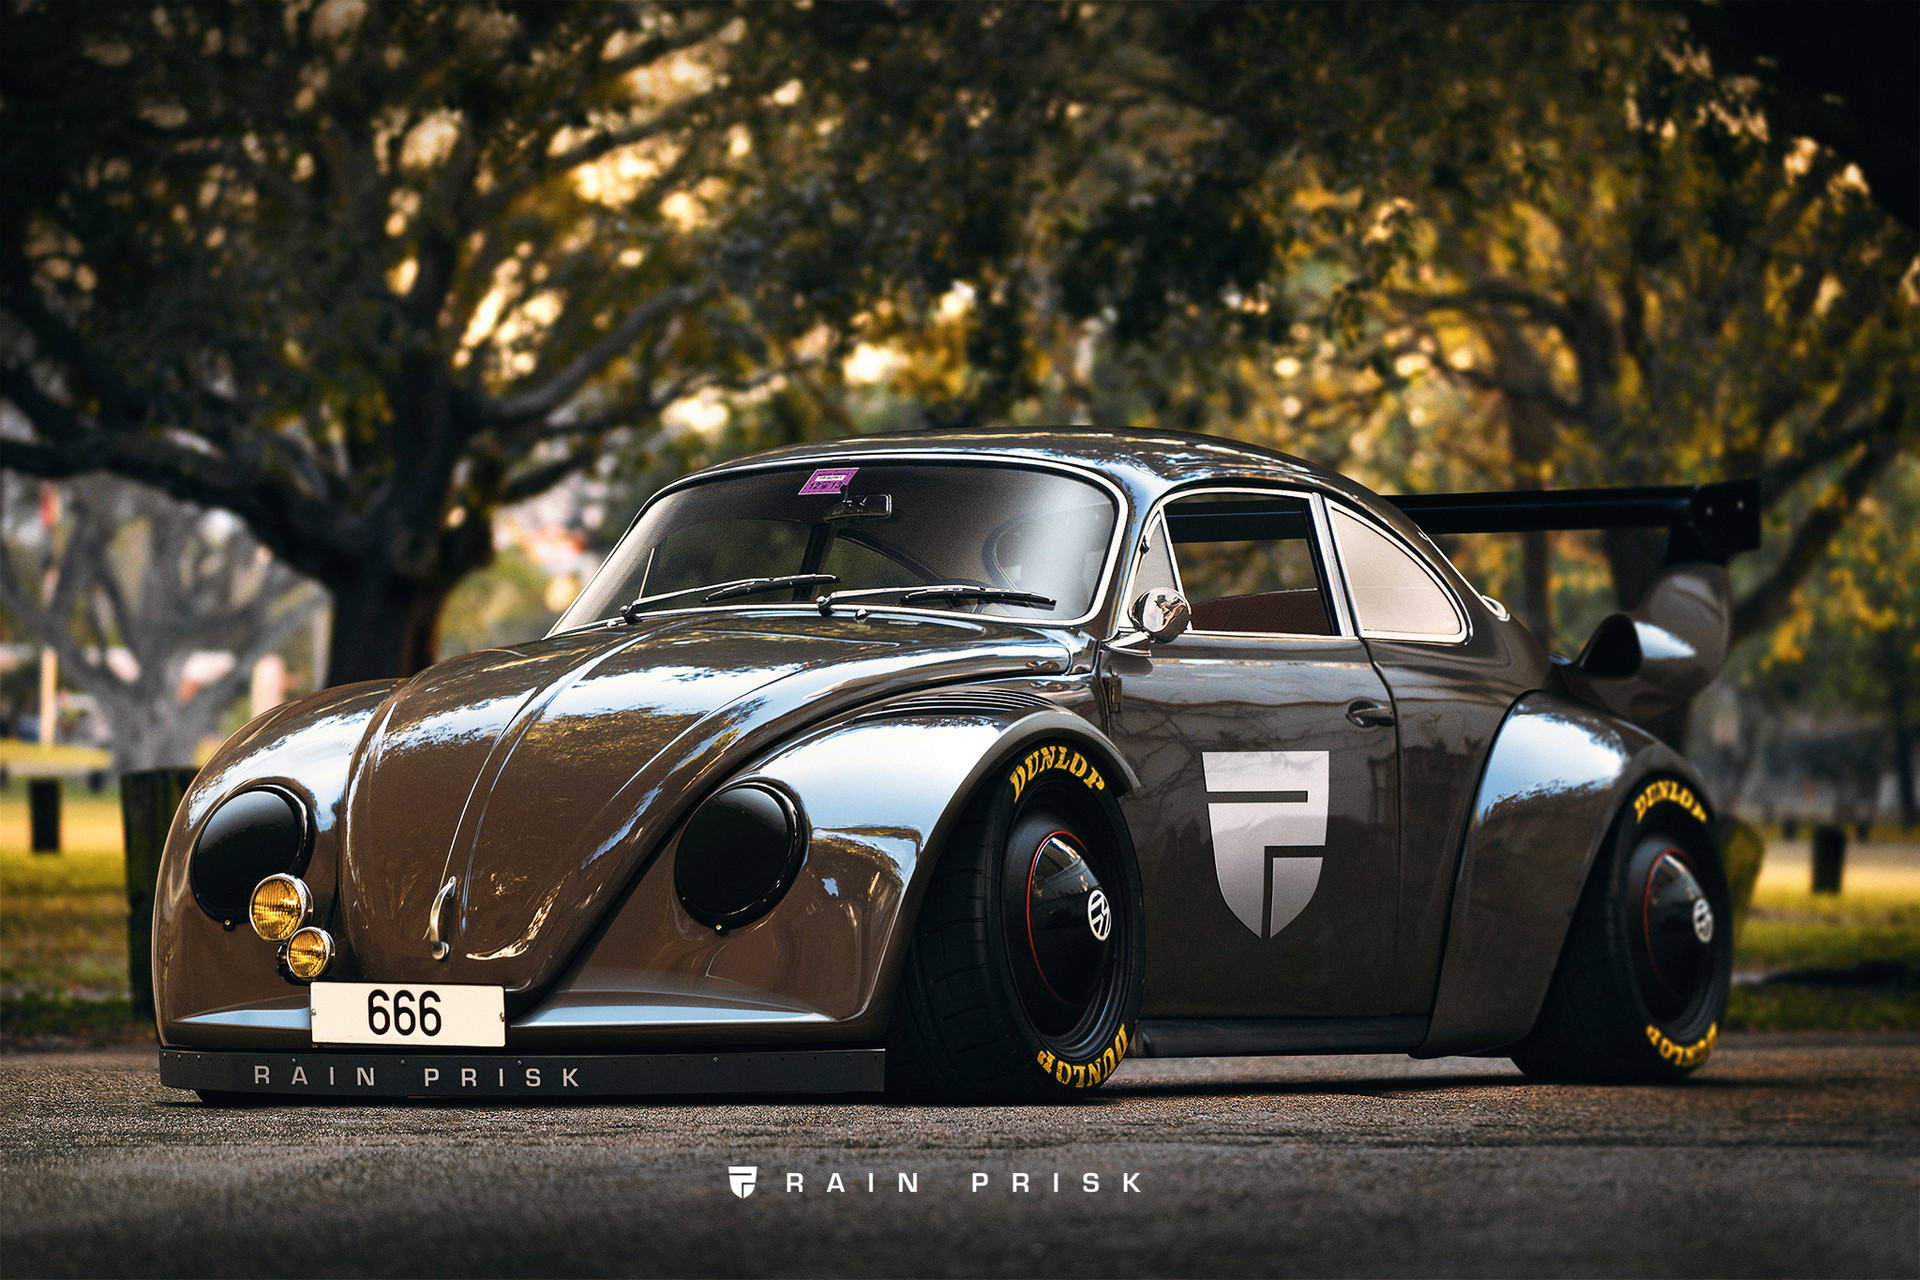 Rain prisk beetle 356